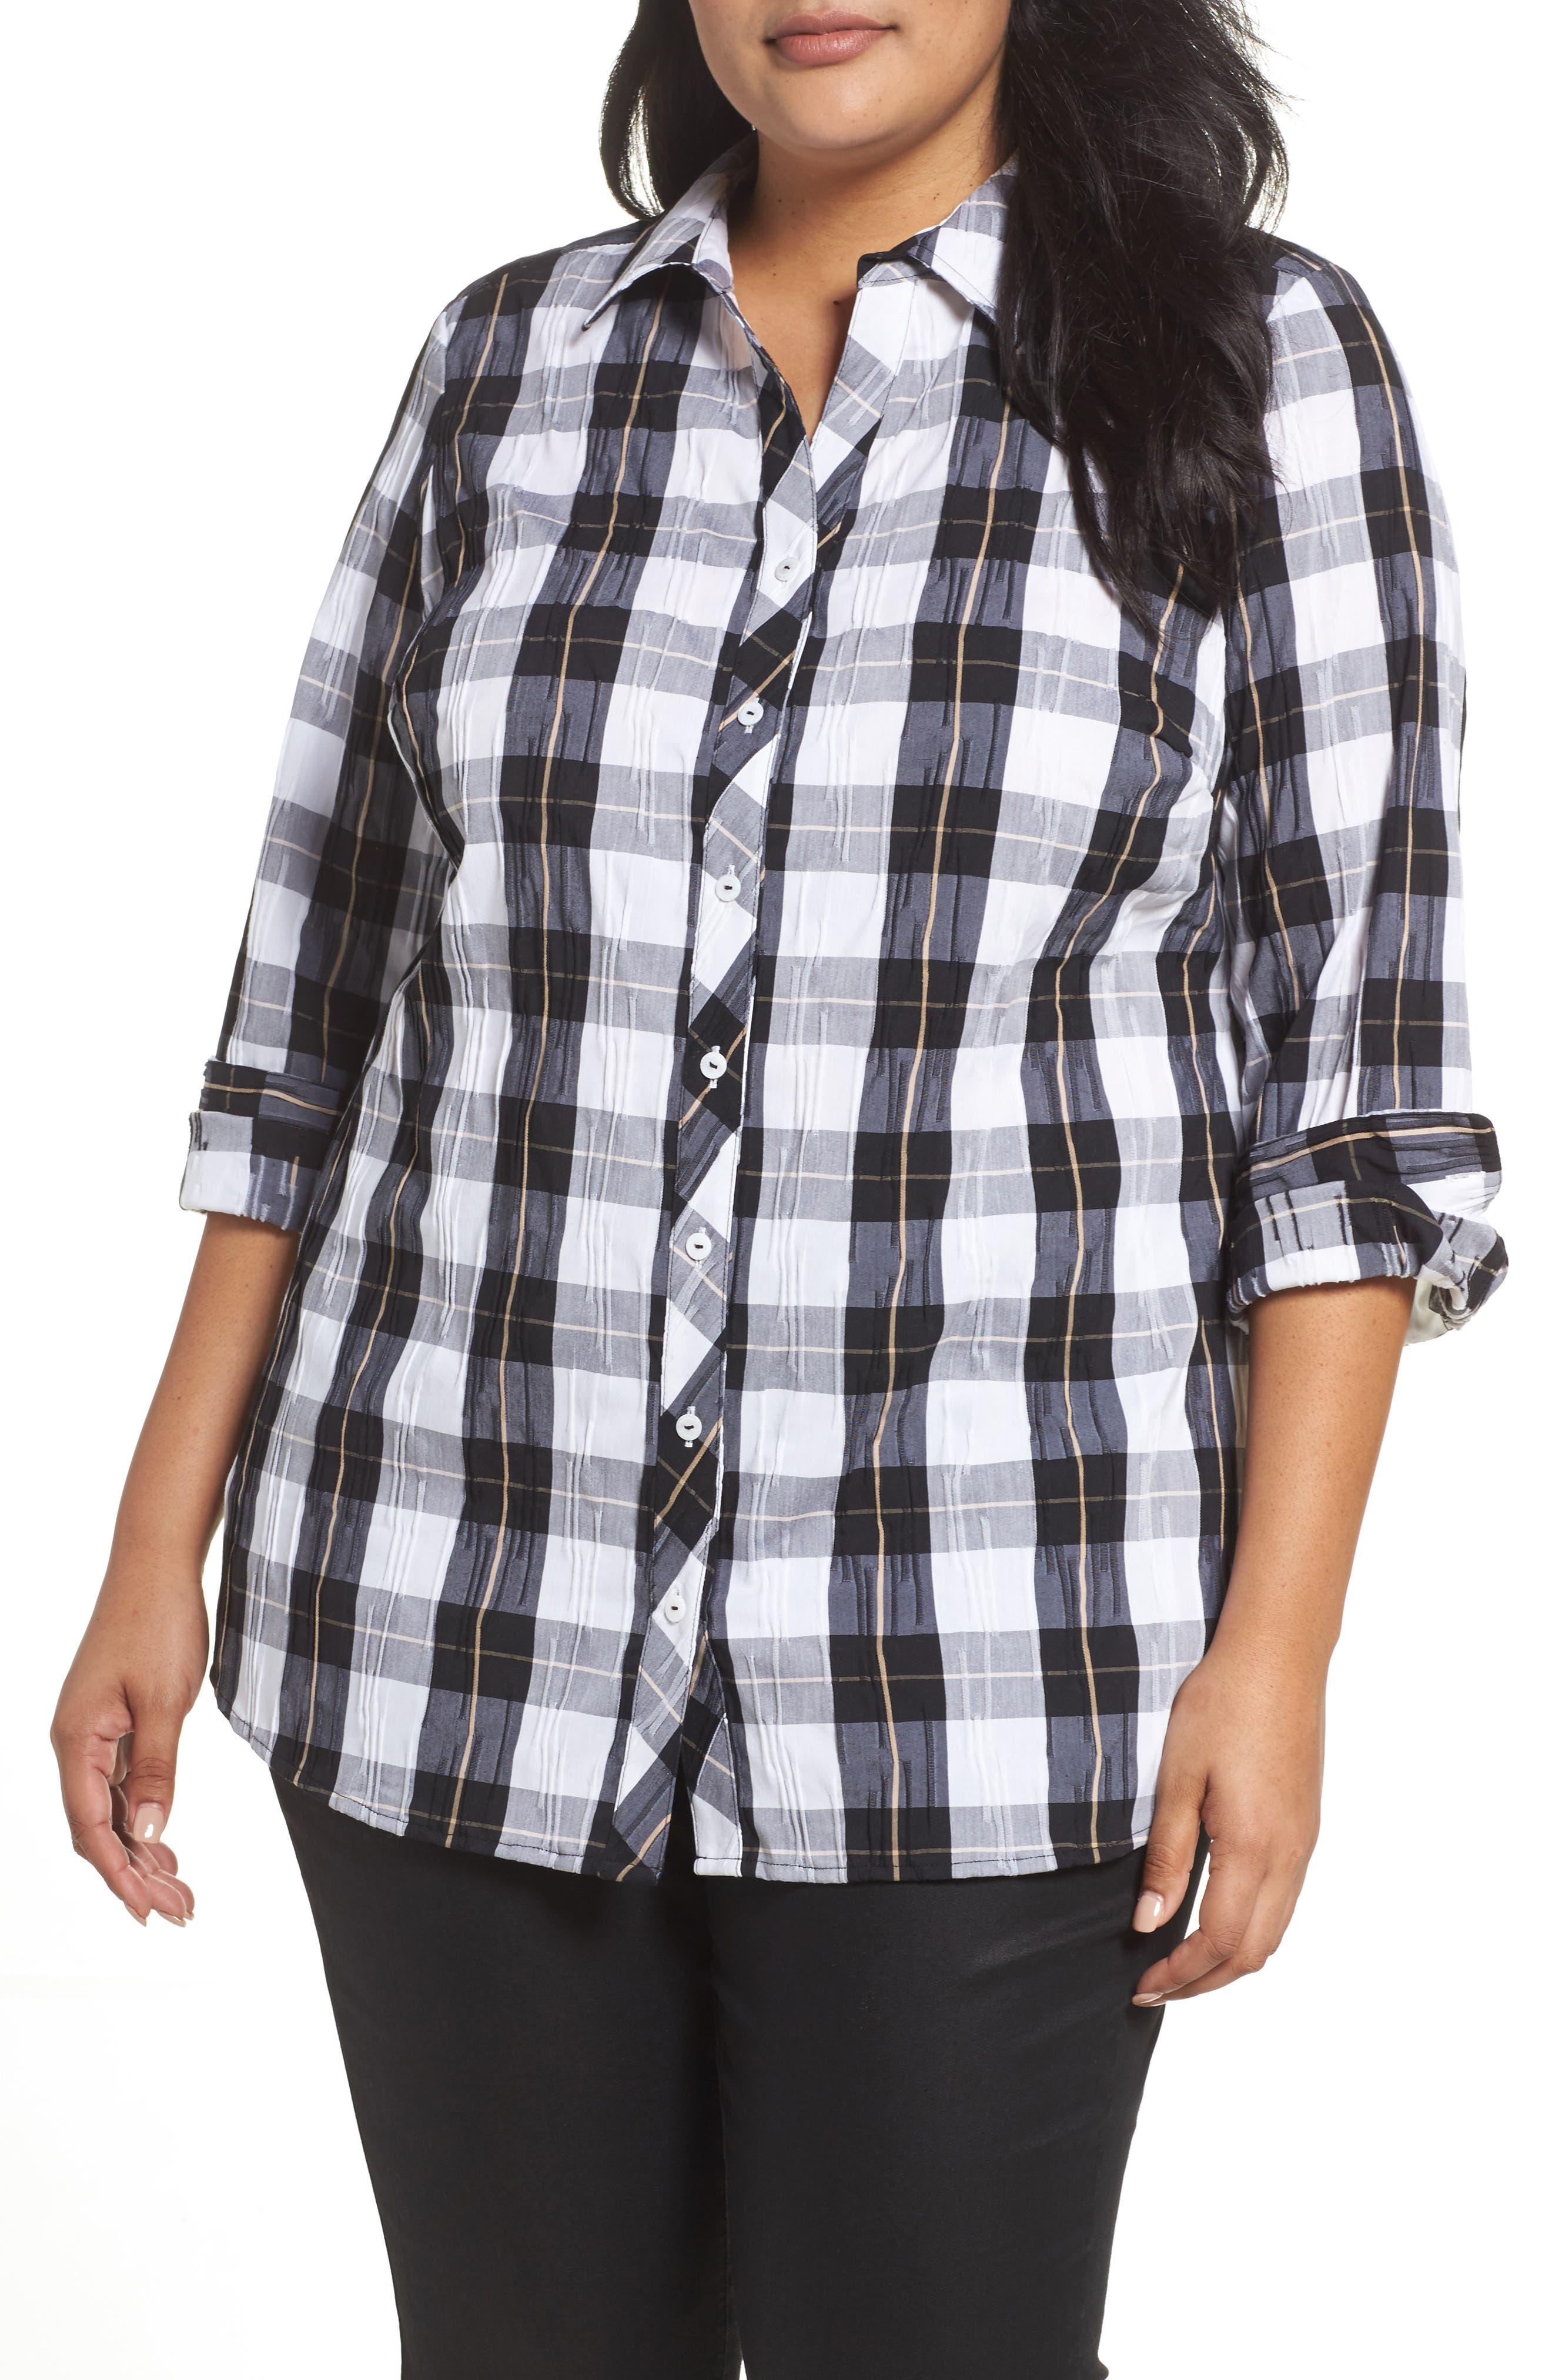 Foxcroft Fay Crinkle Plaid Stretch Cotton Blend Tunic Shirt (Plus Size)